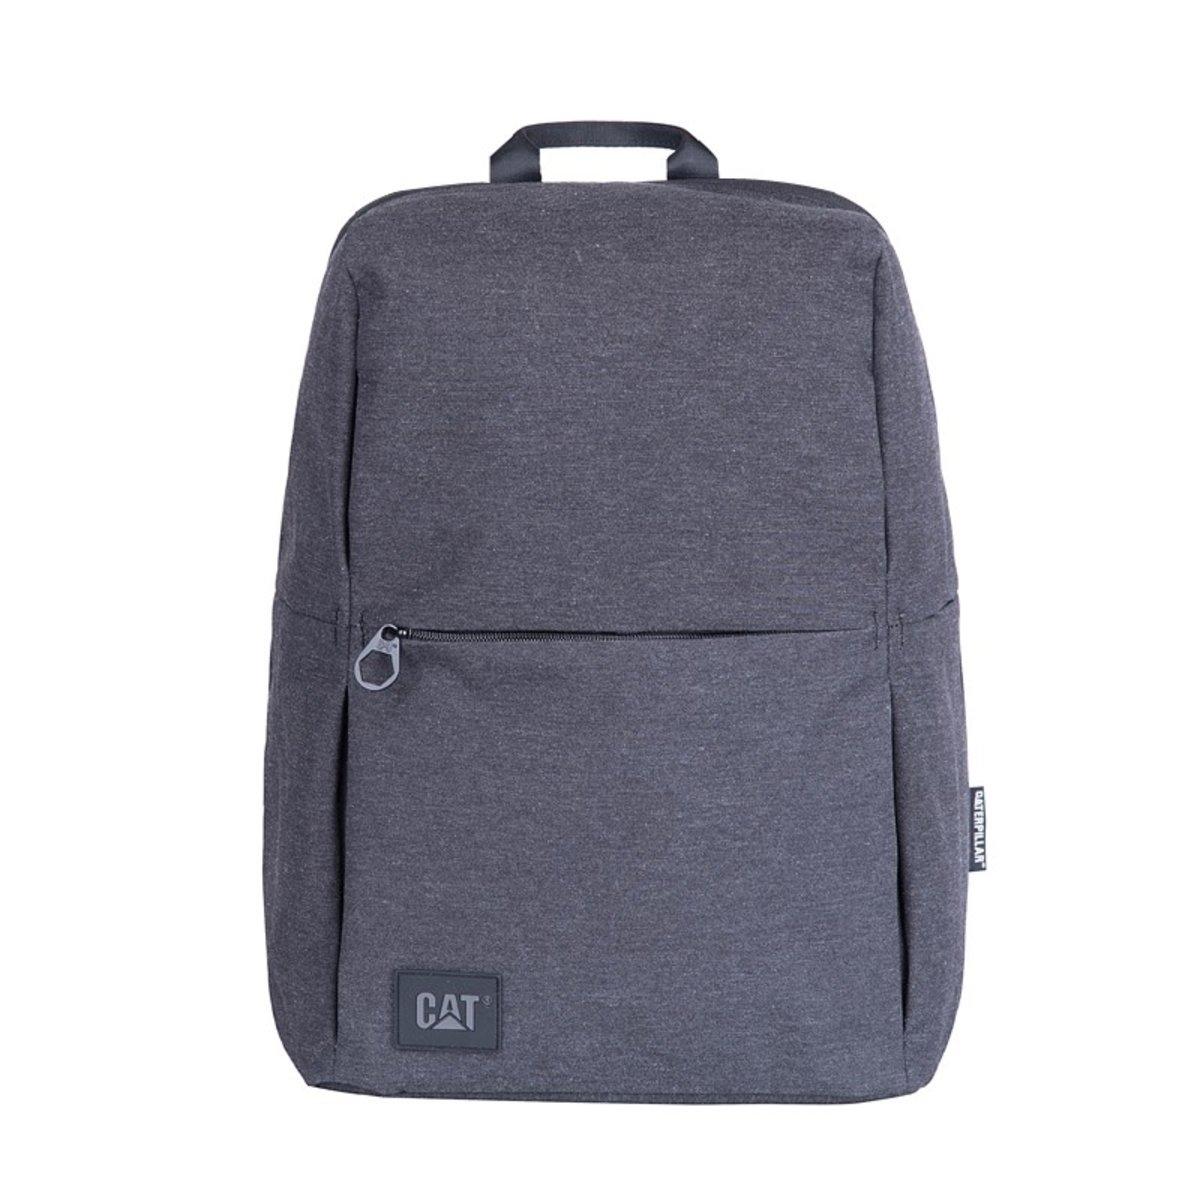 Mono Inno Backpack (Caviar)|背包 背囊 旅遊外出必備